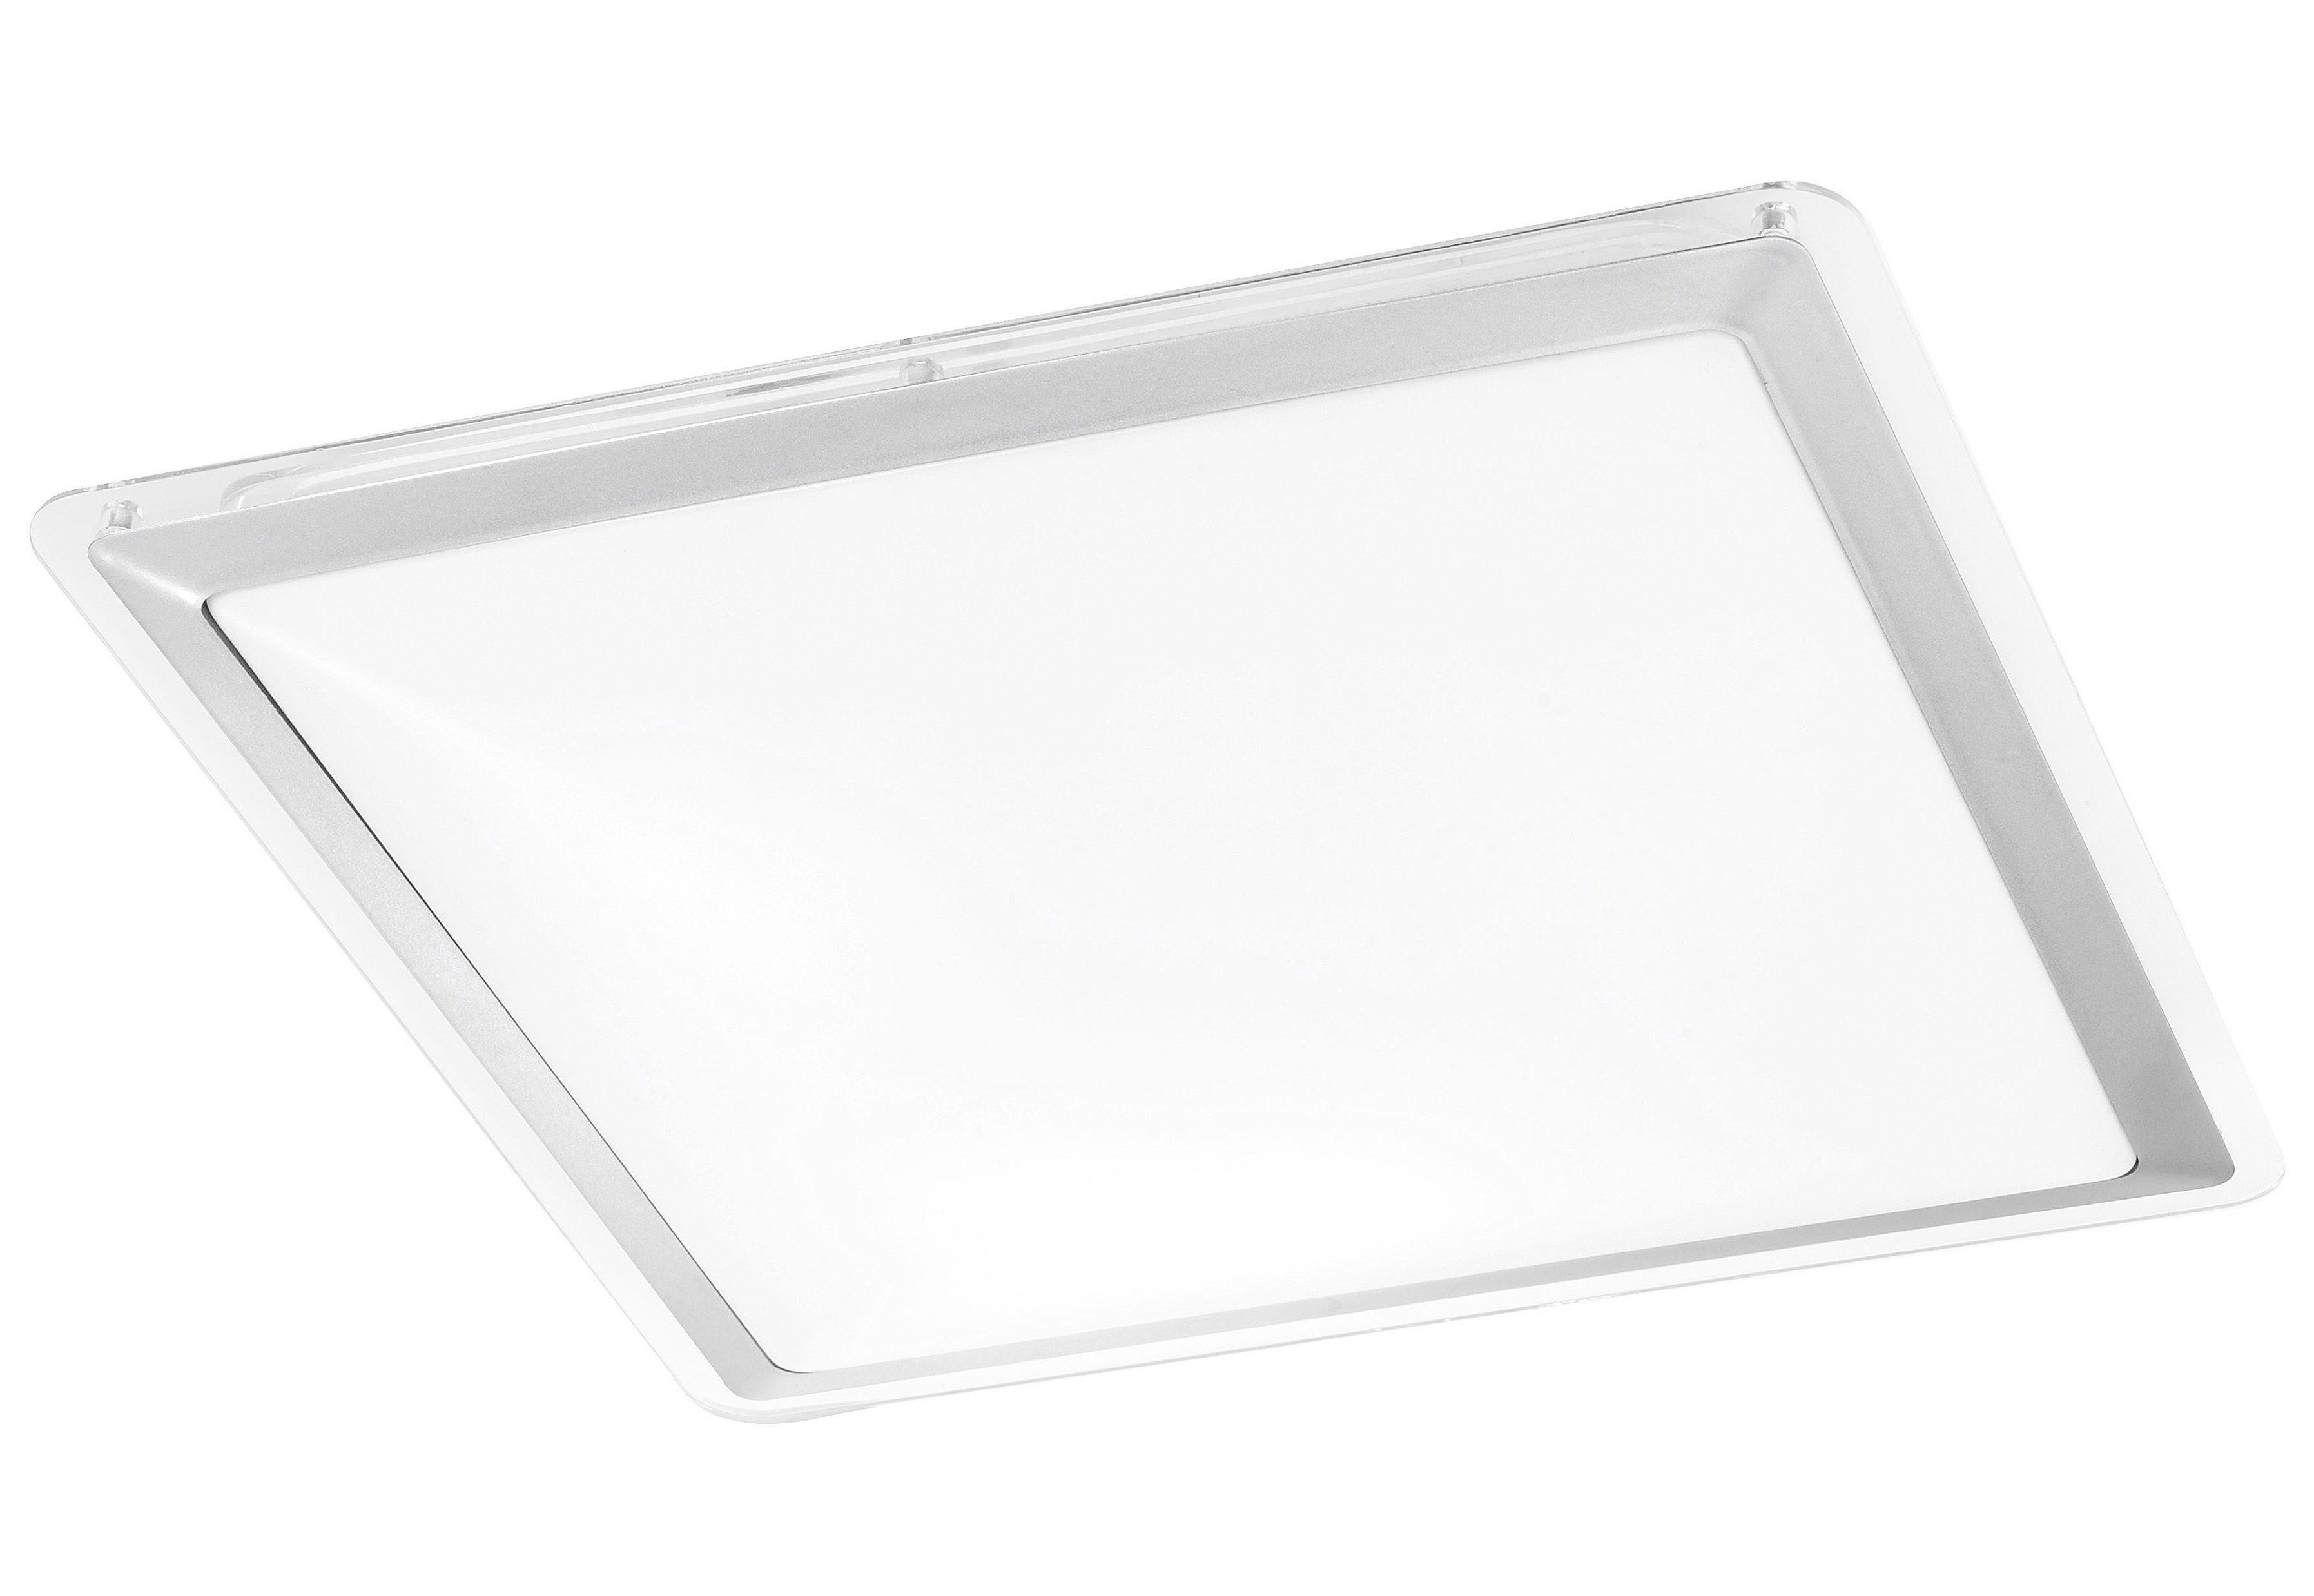 Leuchten Direkt LED-Deckenleuchte / LED-Wandleuchte, 1flg., »LABOL«